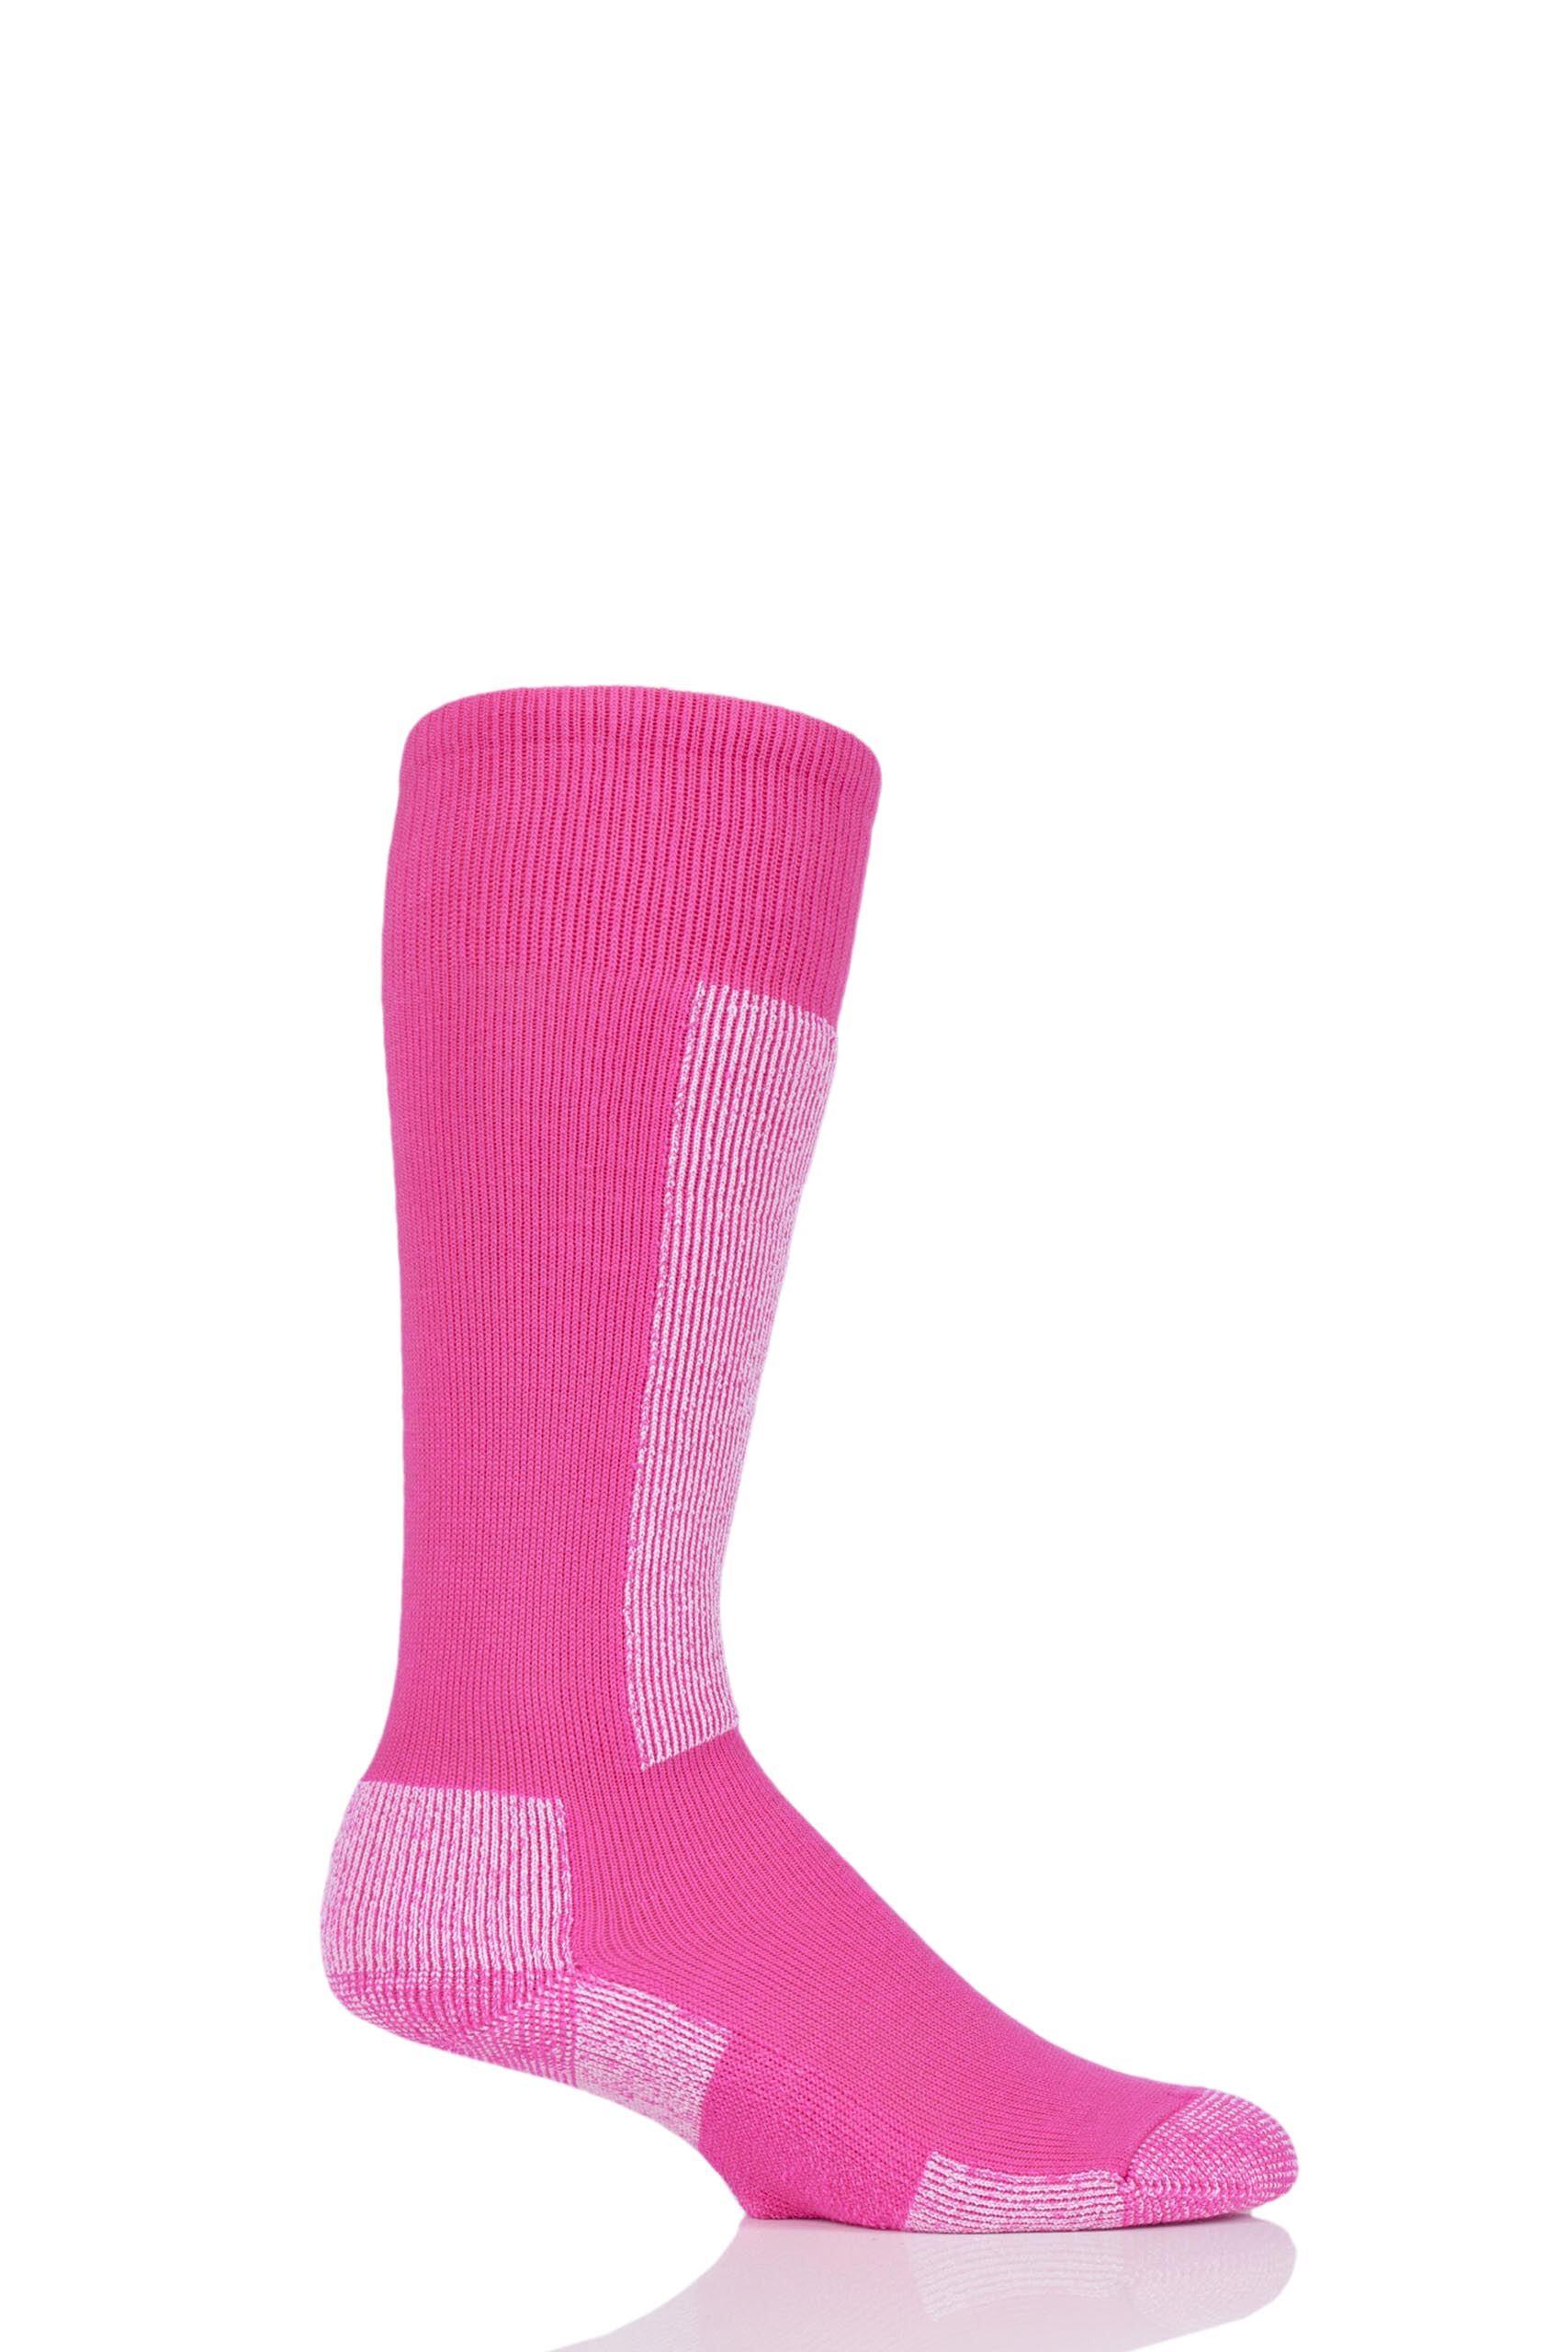 Image of 1 Pack Schuss Pink Lightweight Ski Socks Unisex 8-9.5 Unisex - Thorlos